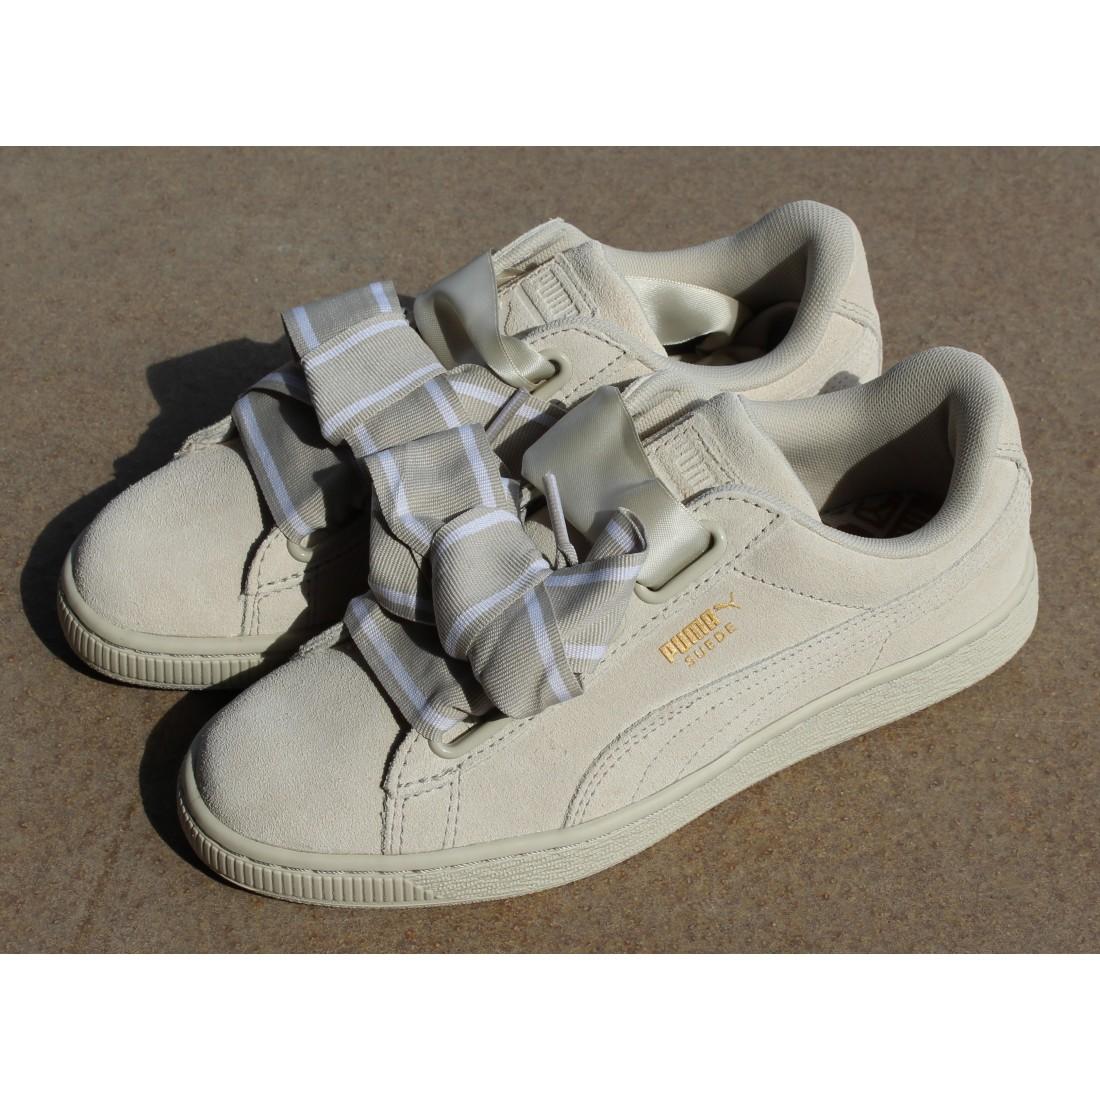 brand new 11976 29c72 Sneakersy Puma Suede Heart Satin II 364084 04